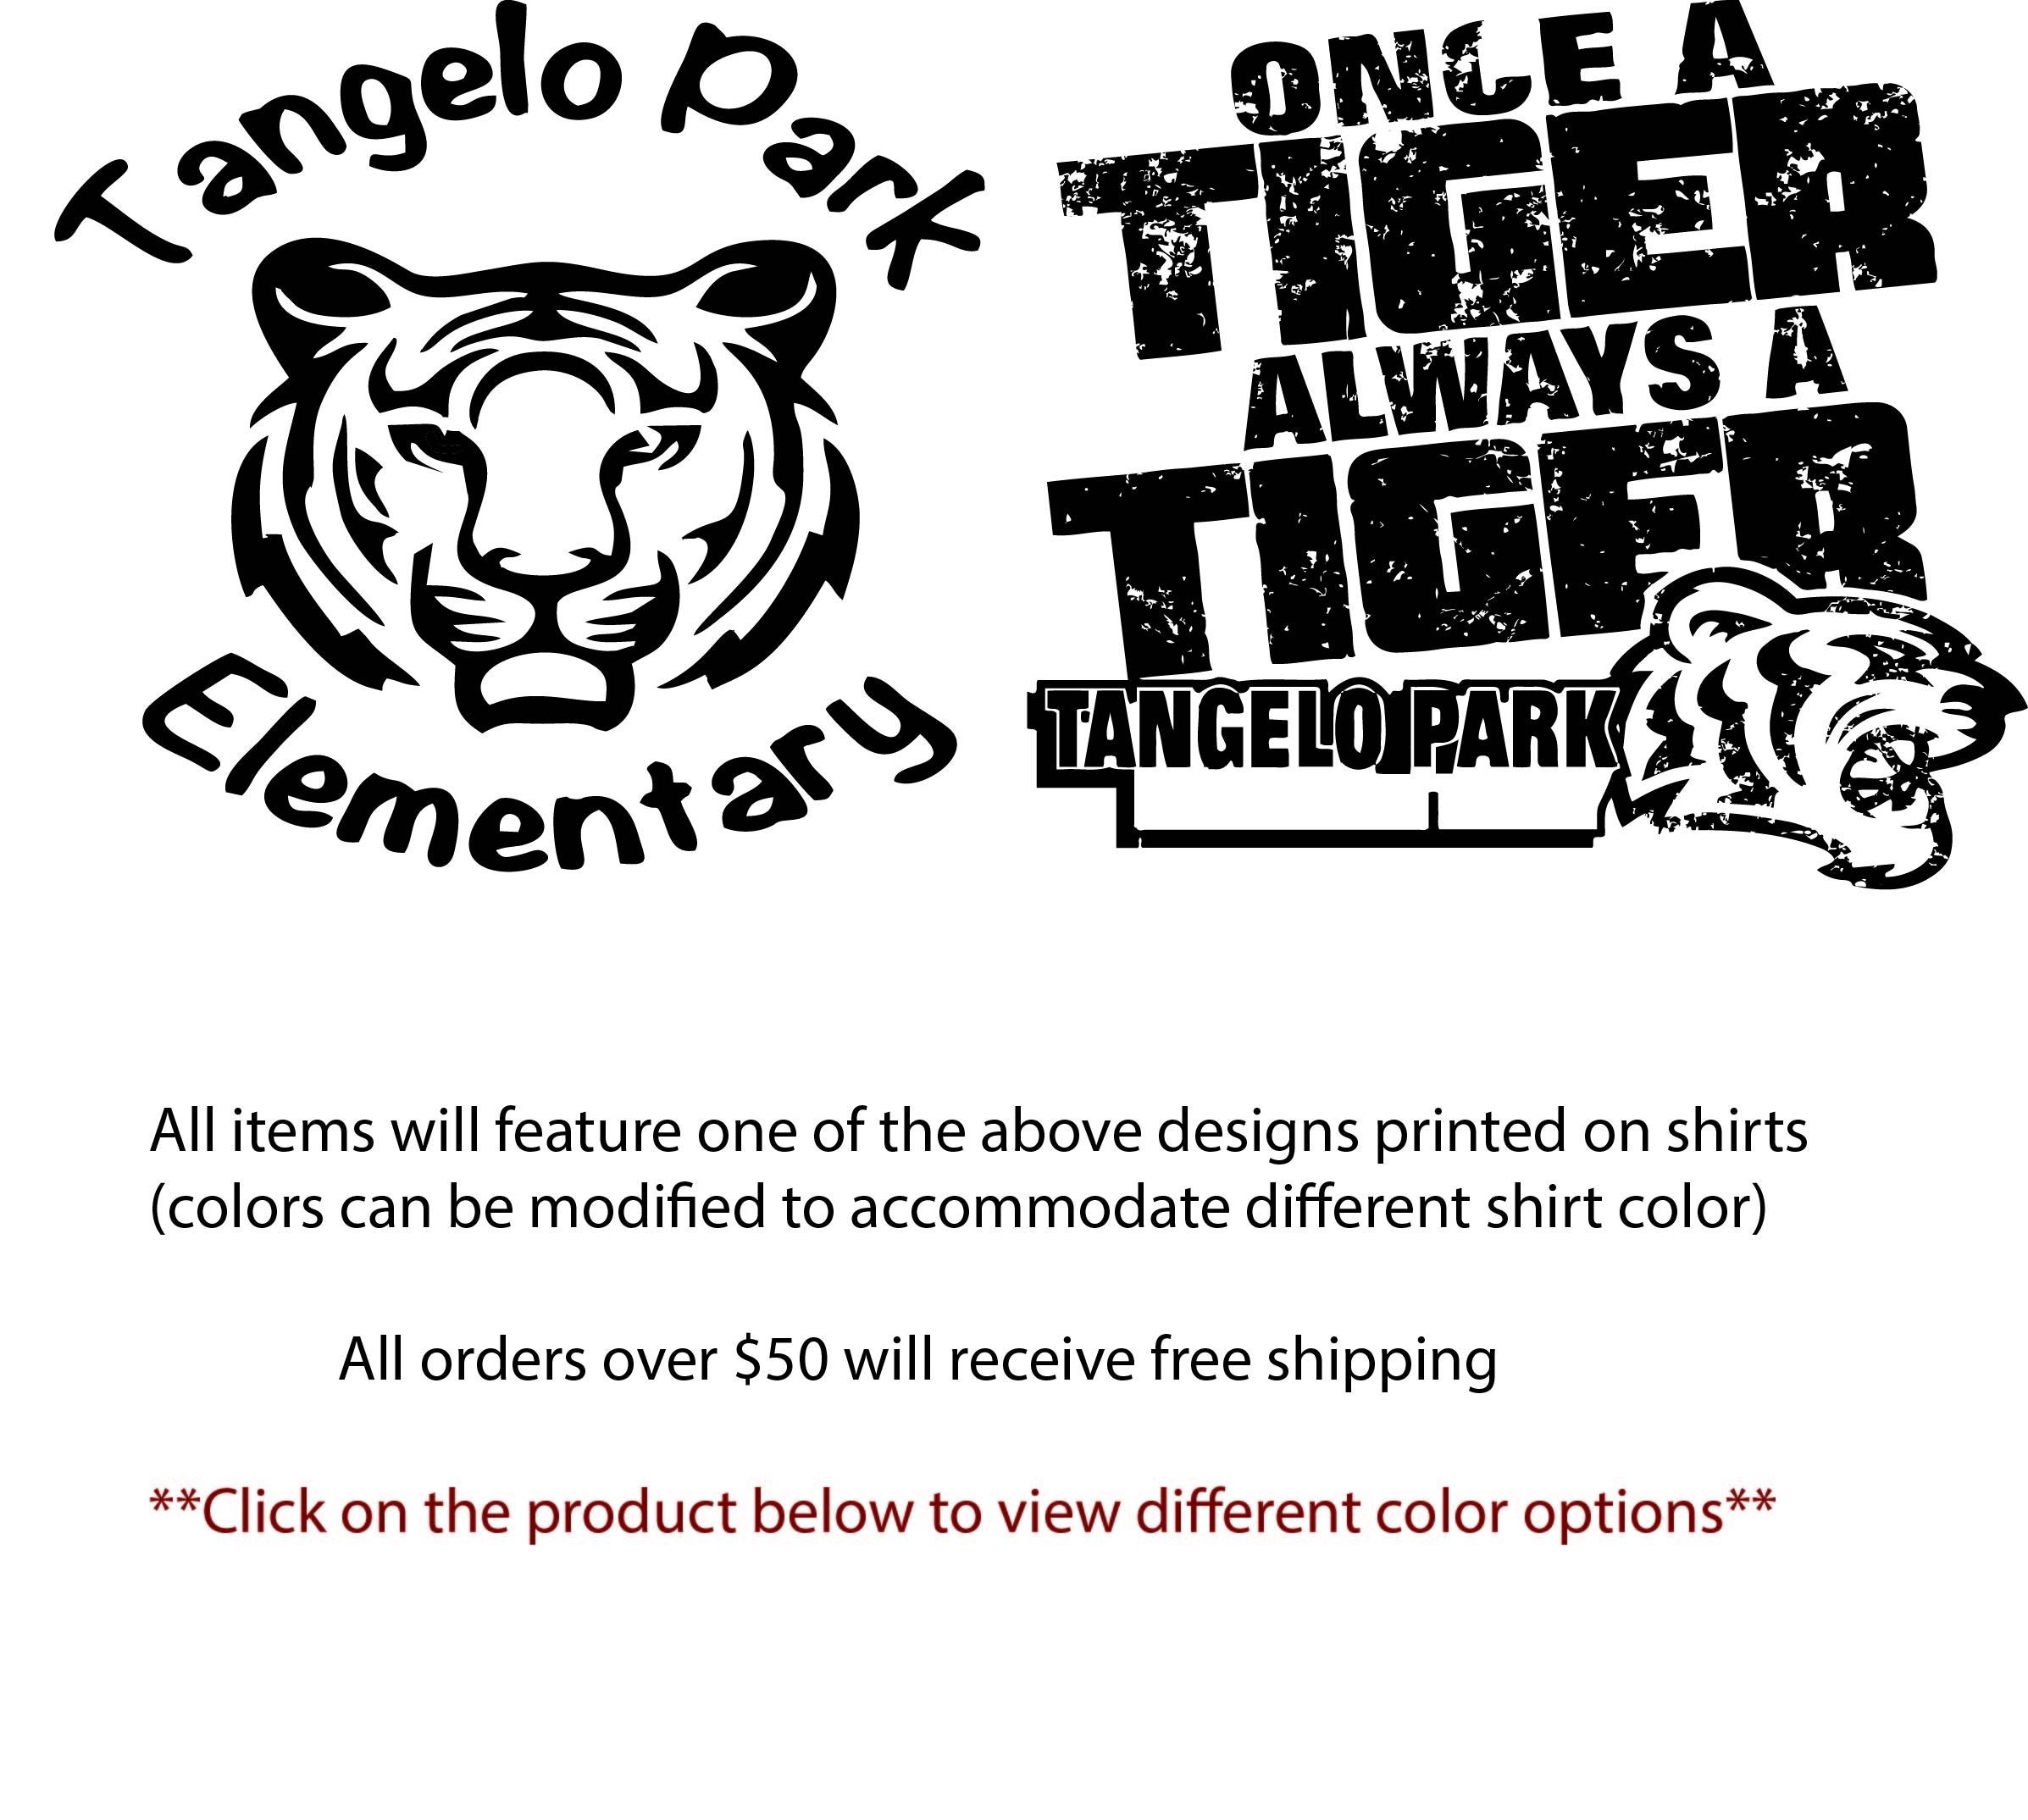 tangelo-park-web-site-header-uniforms-2.jpg